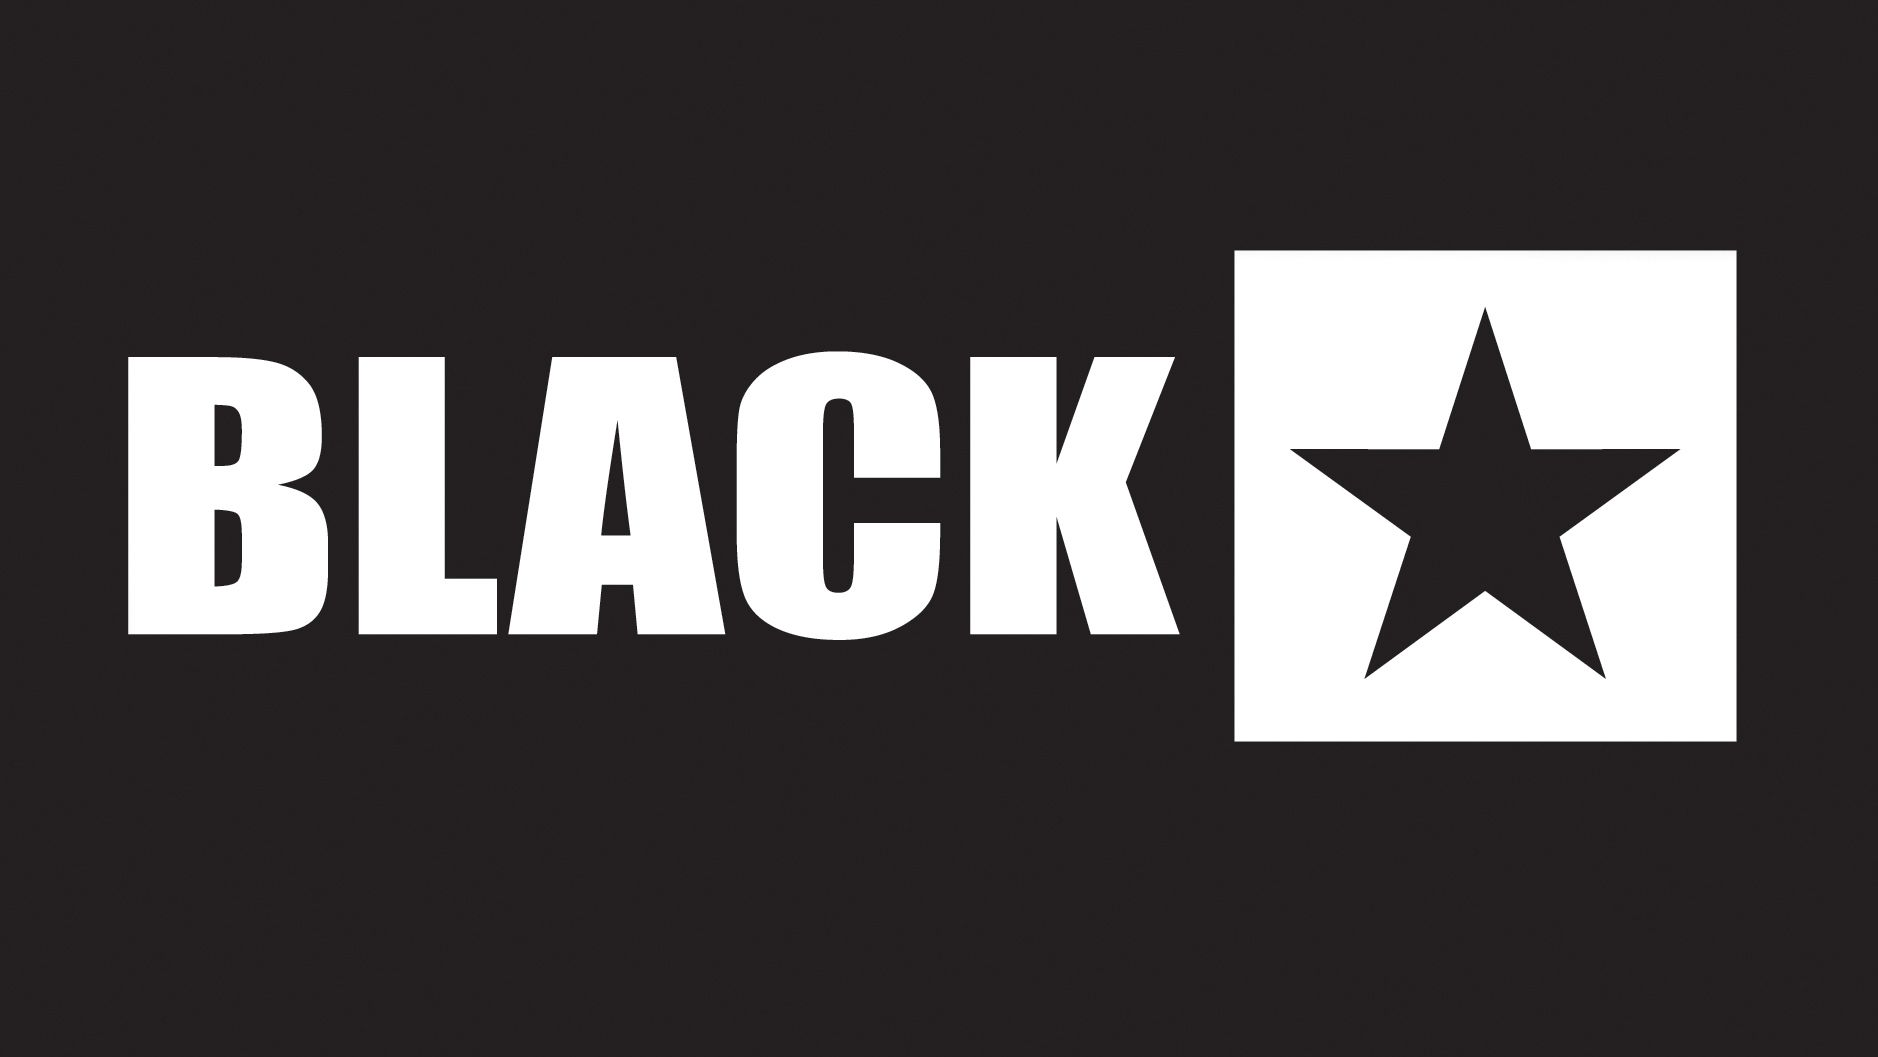 blackstar guitarshop website pics pinterest